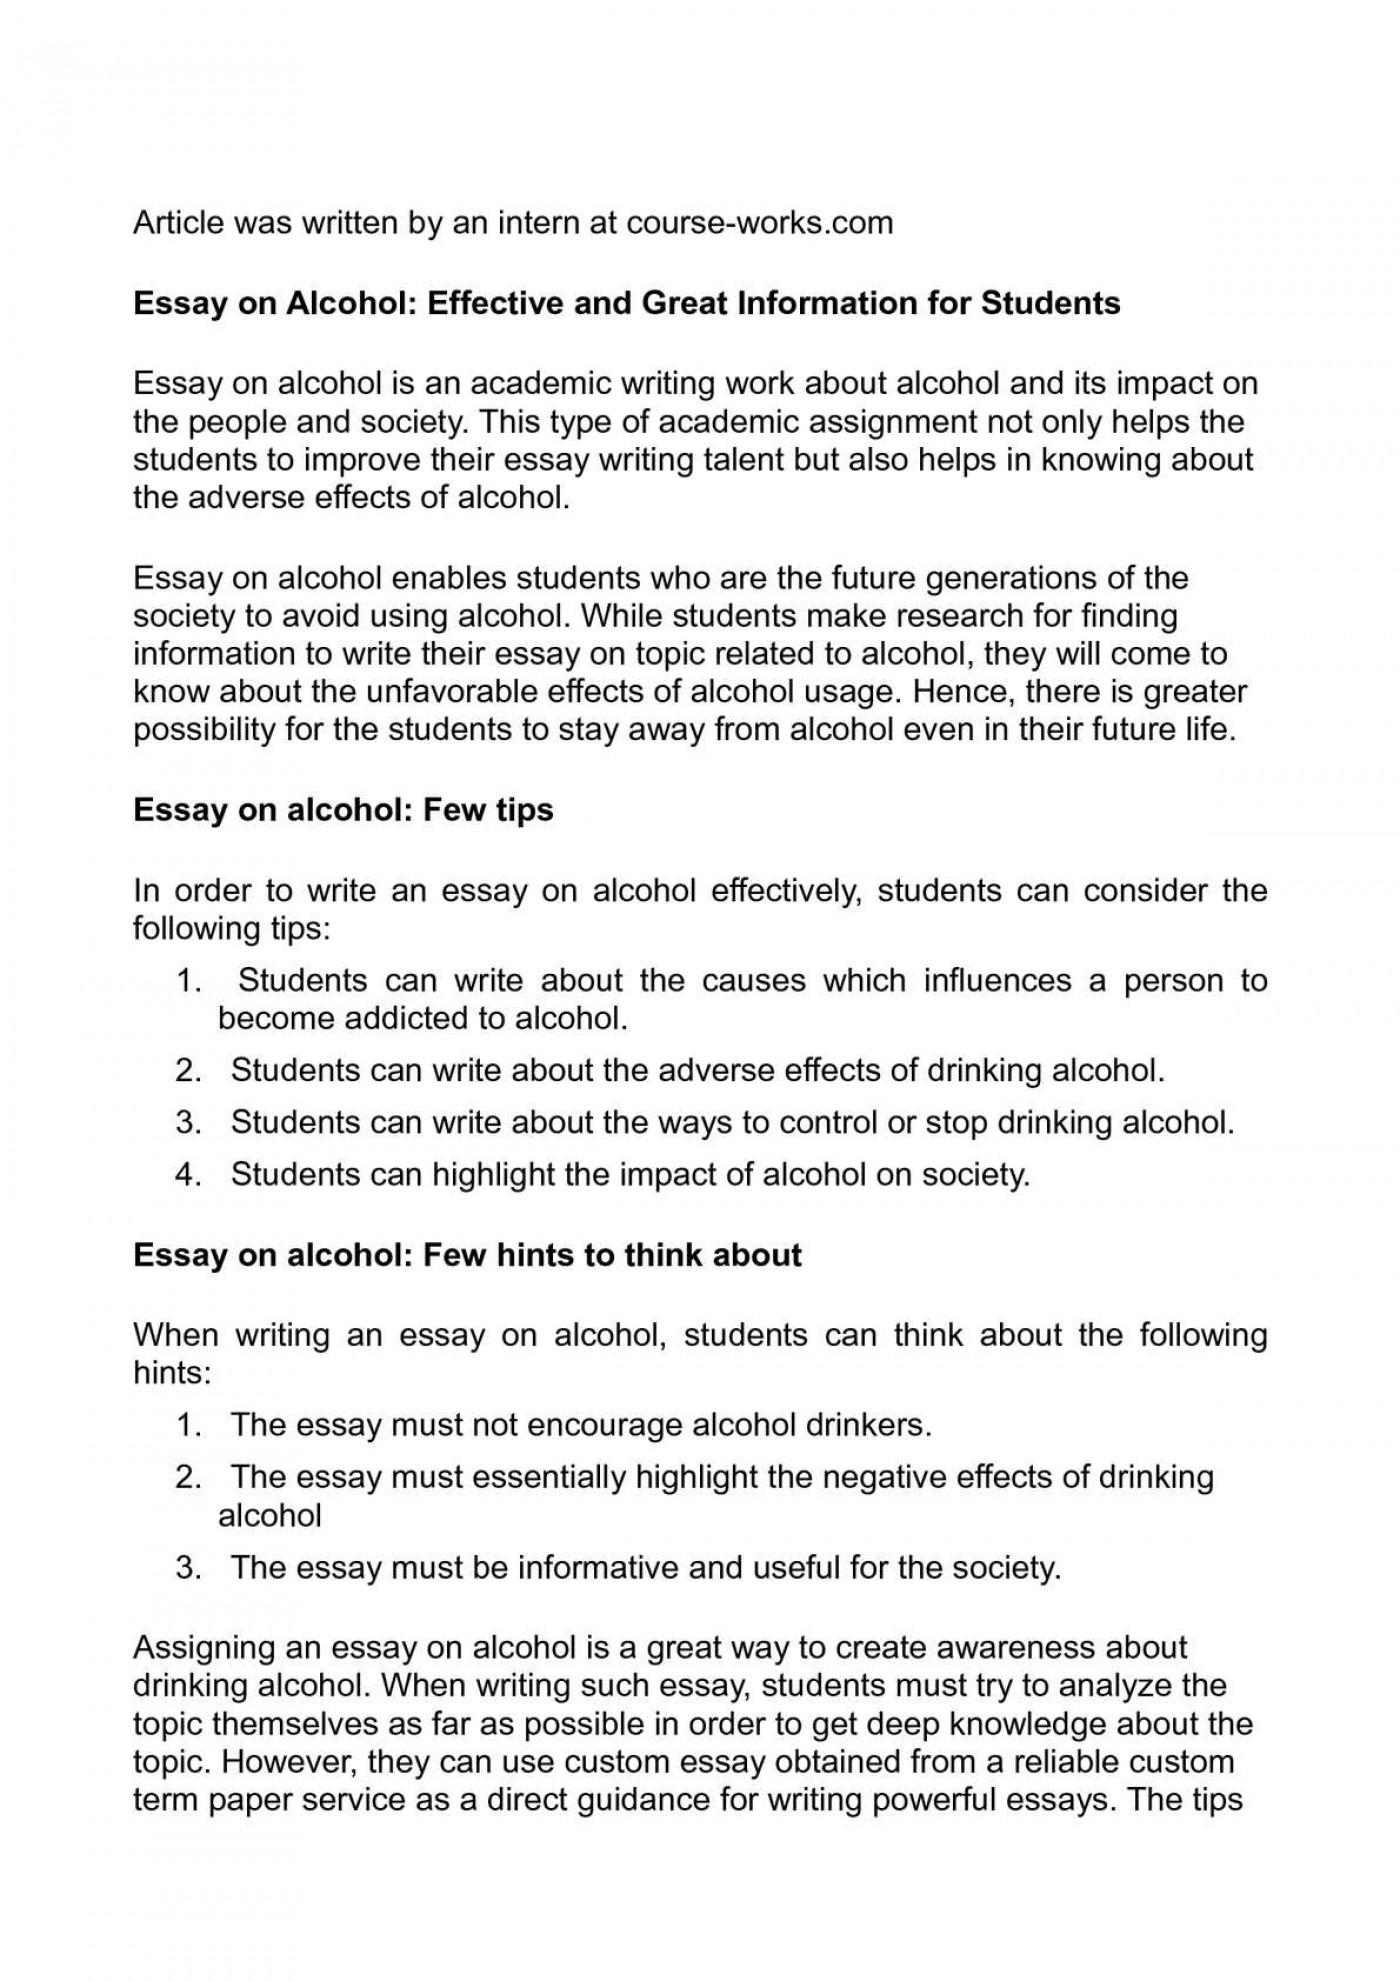 Pakistan defence day essay